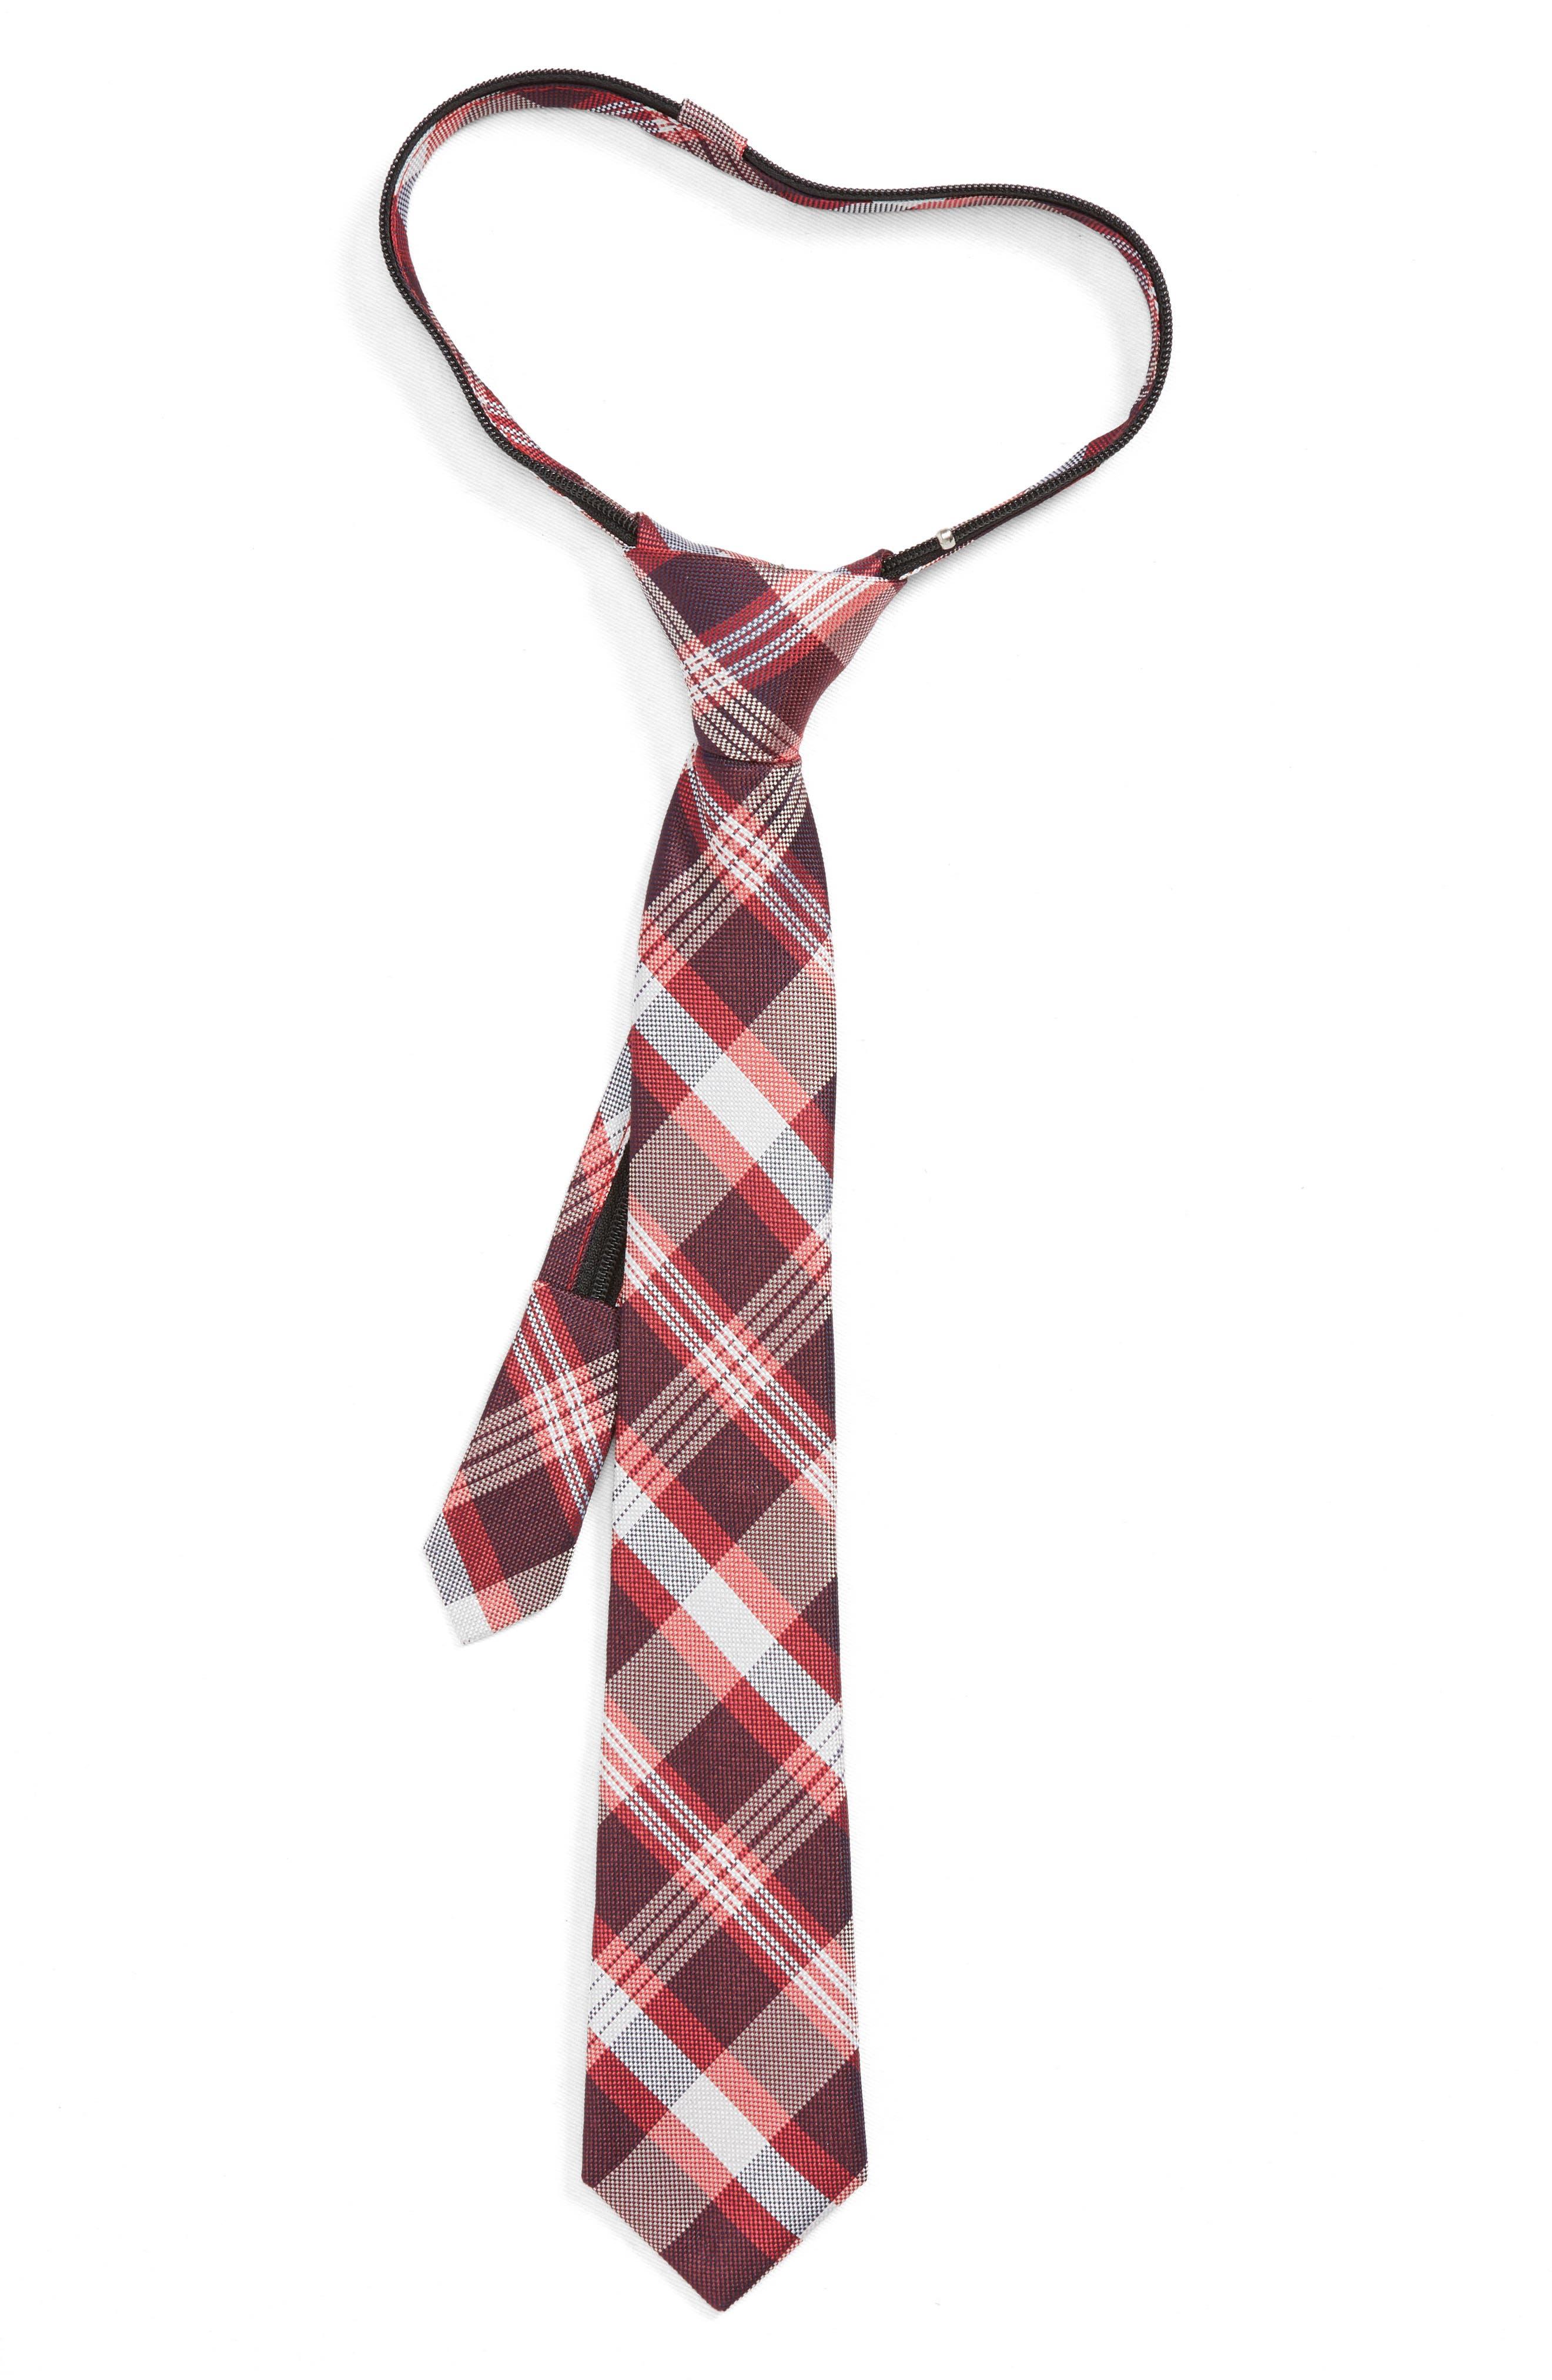 Plaid Silk Zip Tie,                         Main,                         color, RED